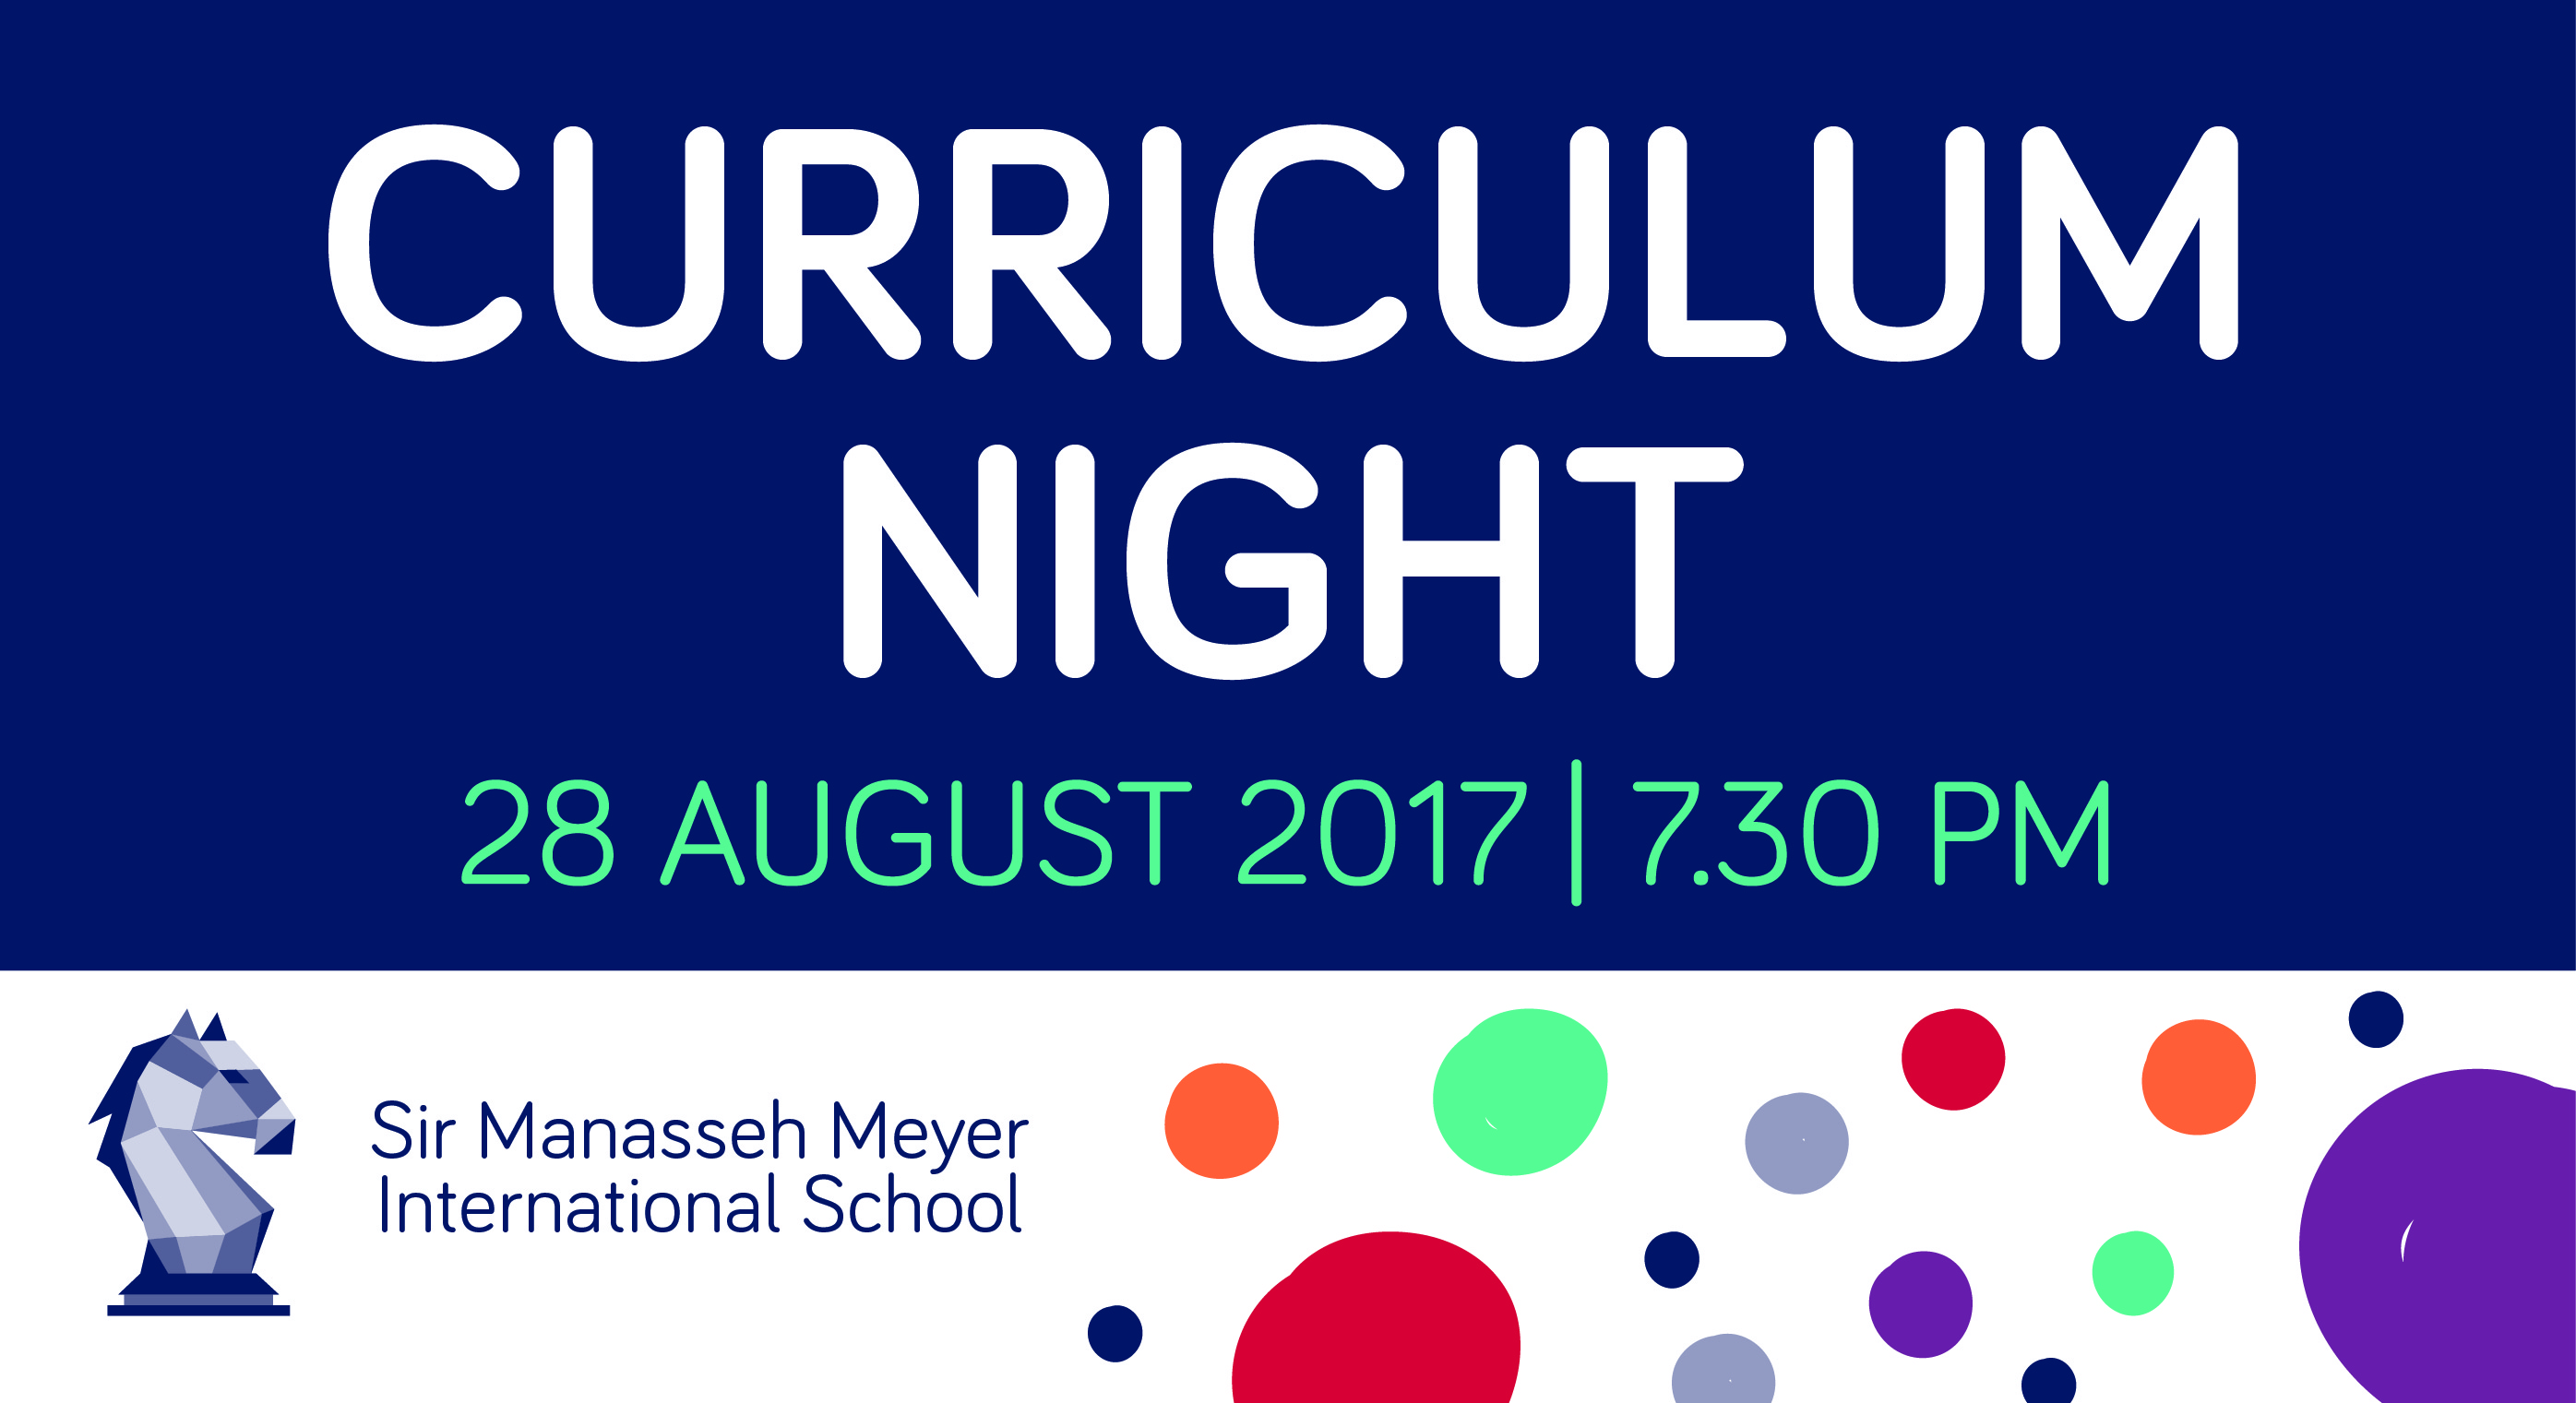 Curriculum Night — Sir Manasseh Meyer International School